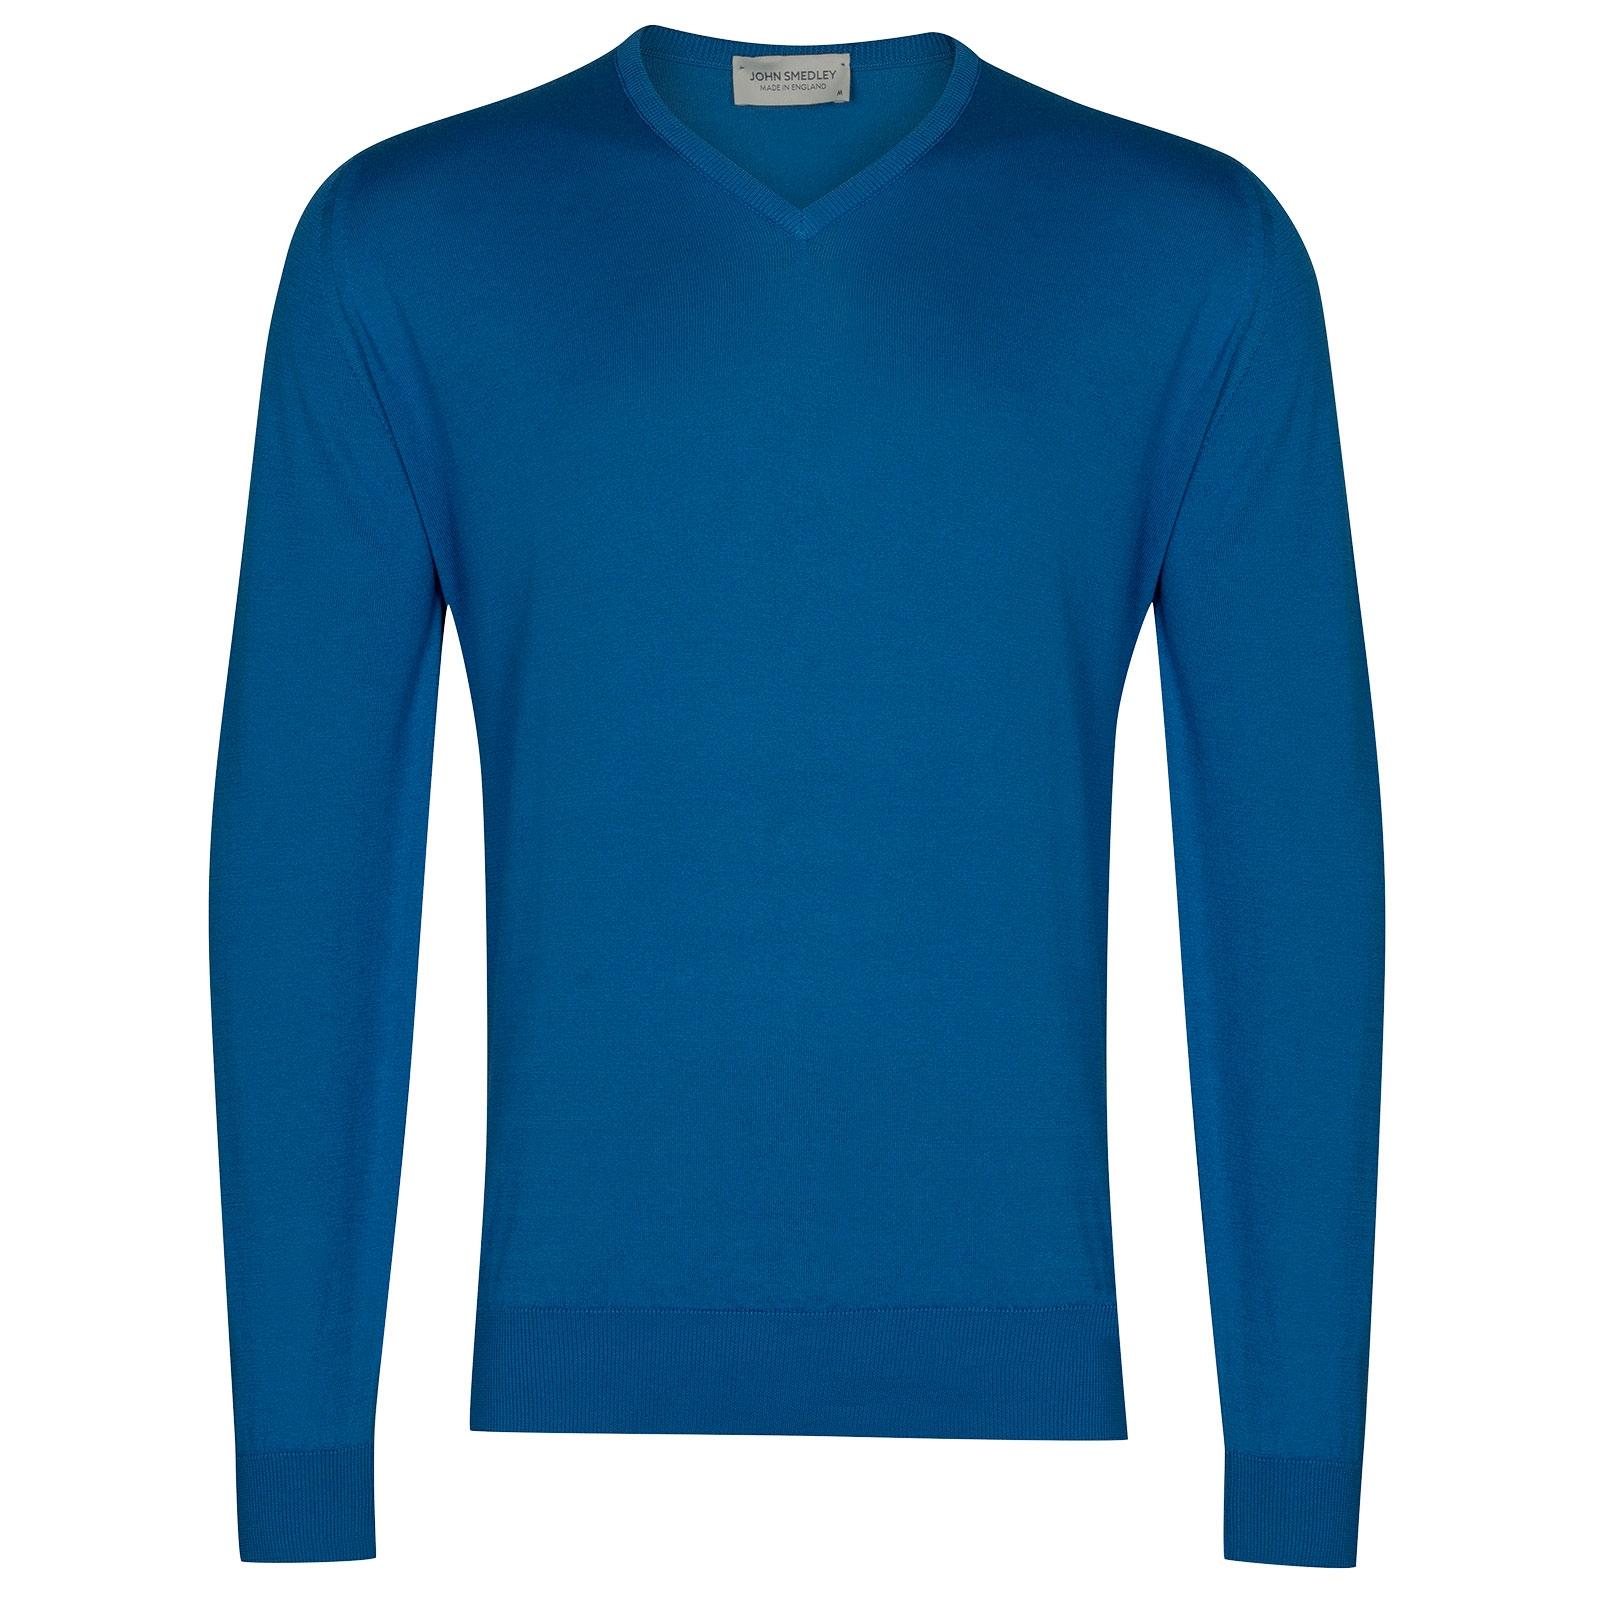 John Smedley Woburn in Statice Blue Pullover-MED